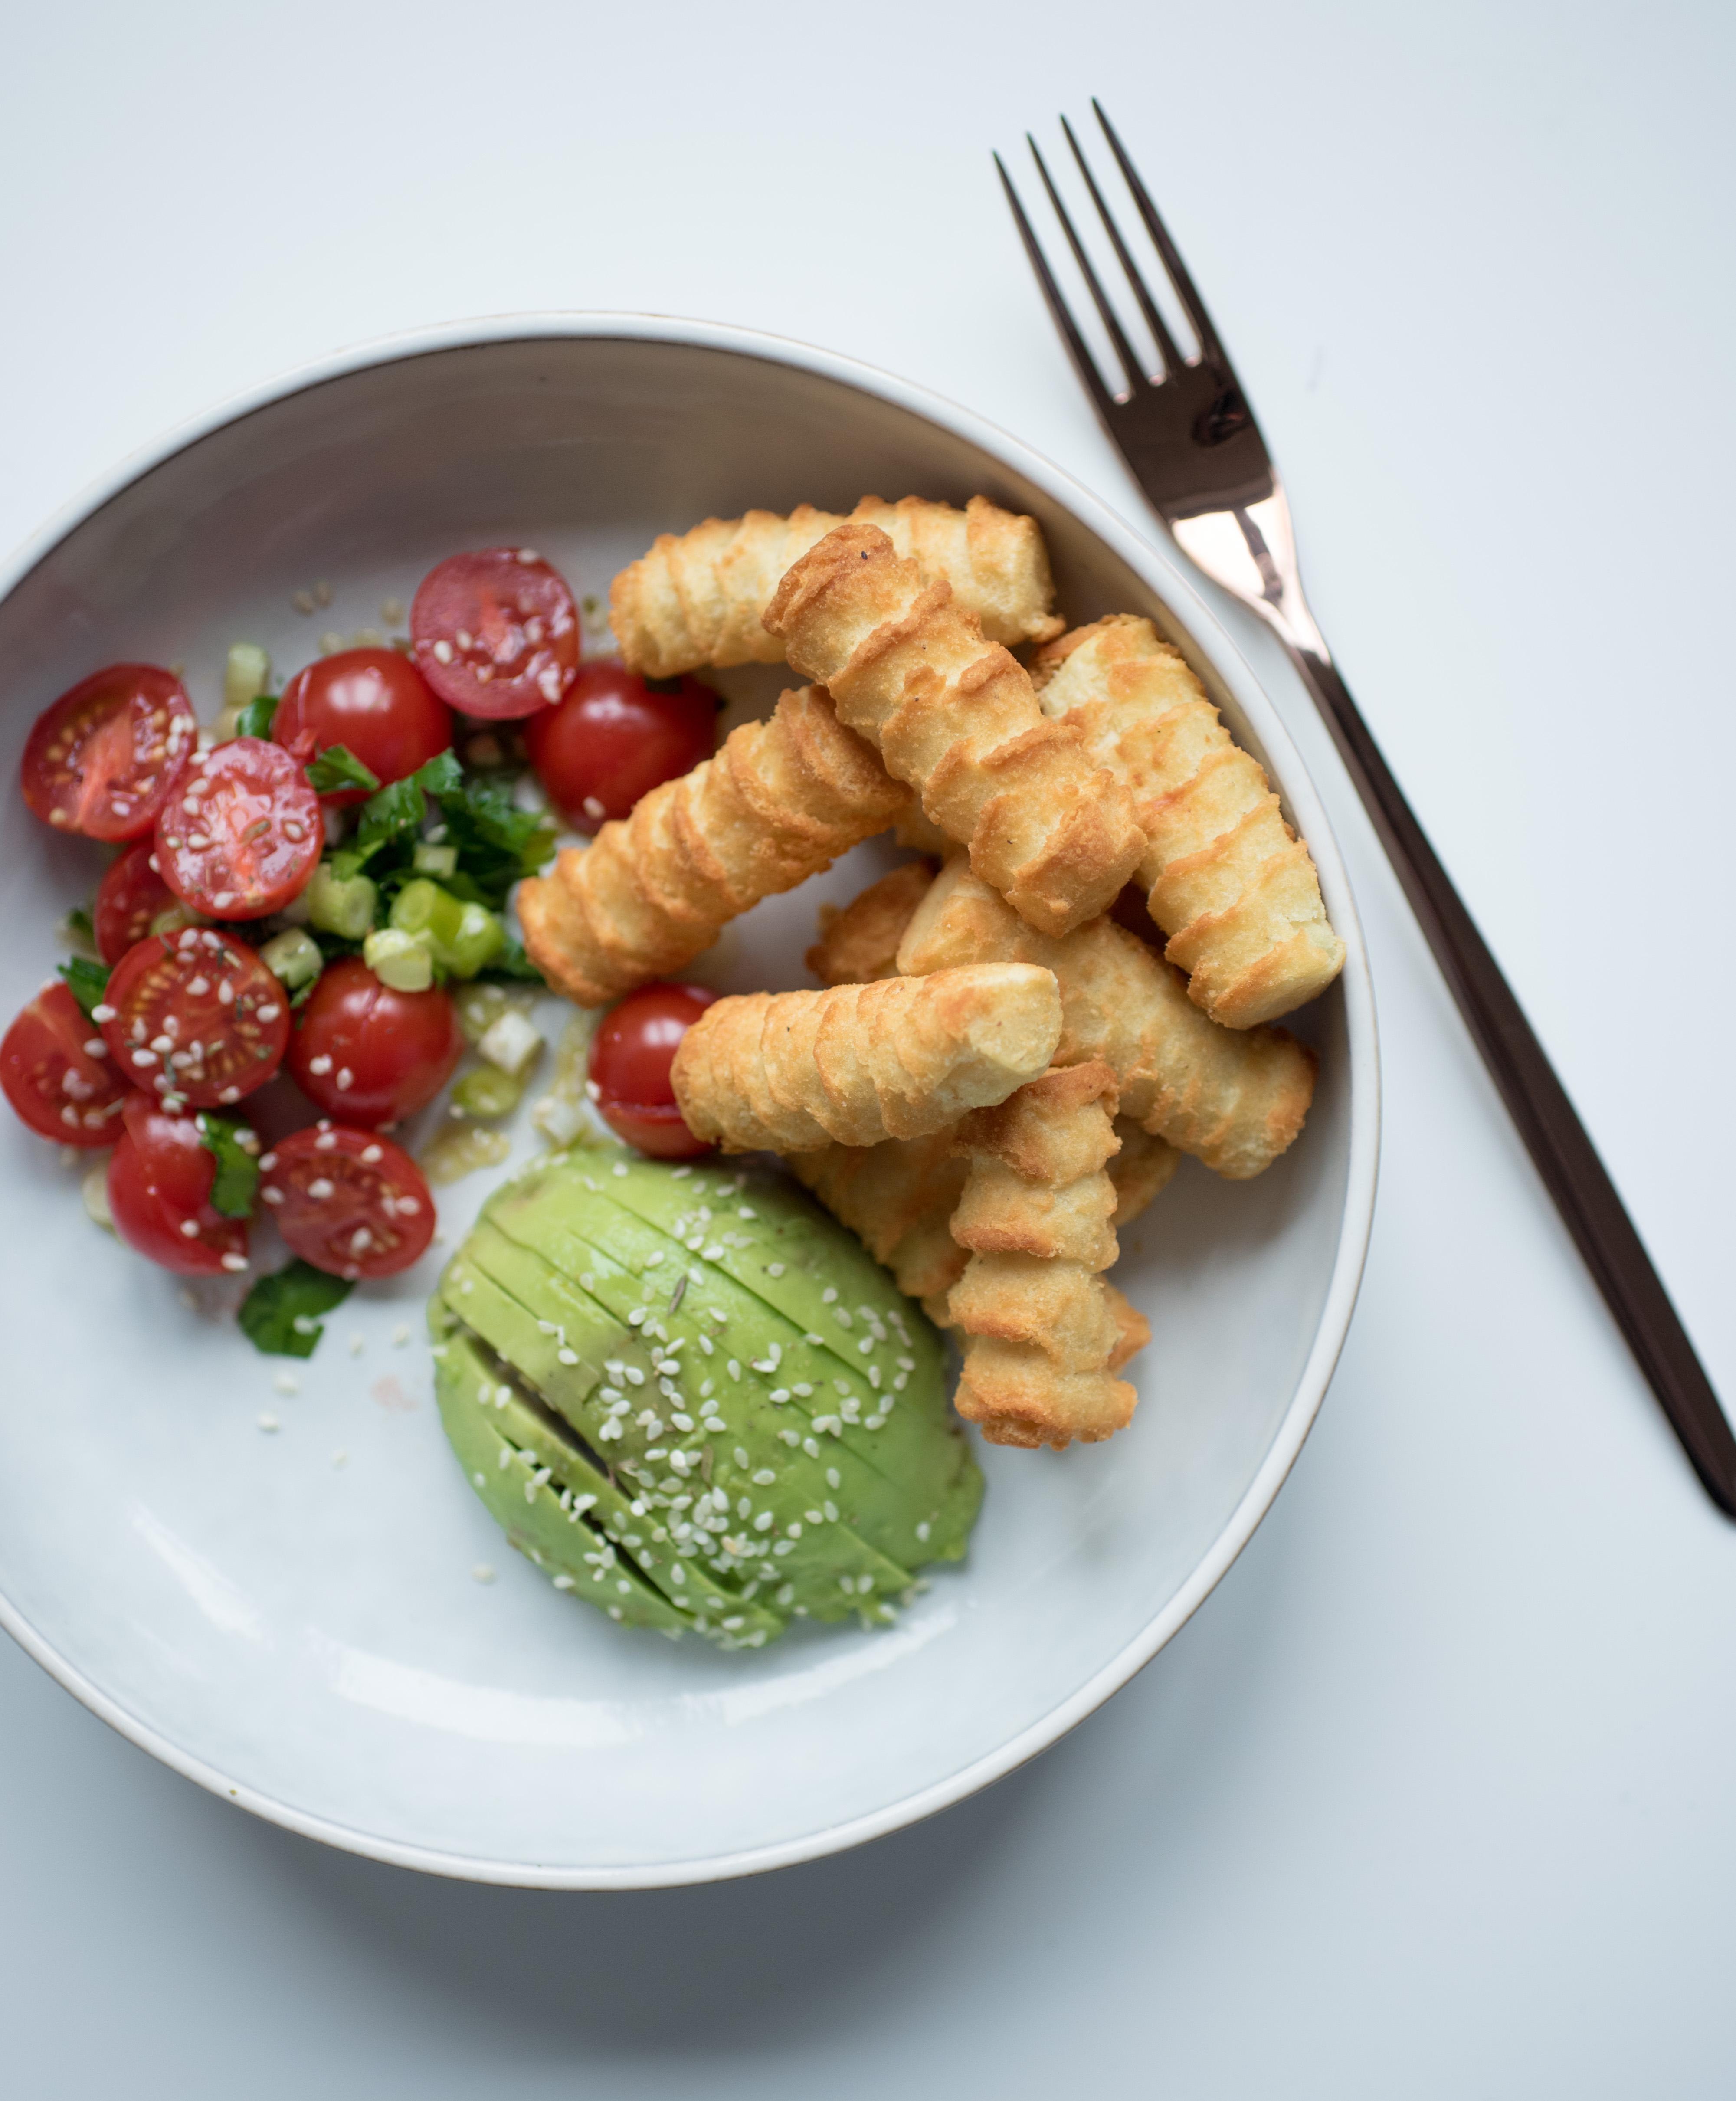 Kroketten mit Avocado und Tomatensalat